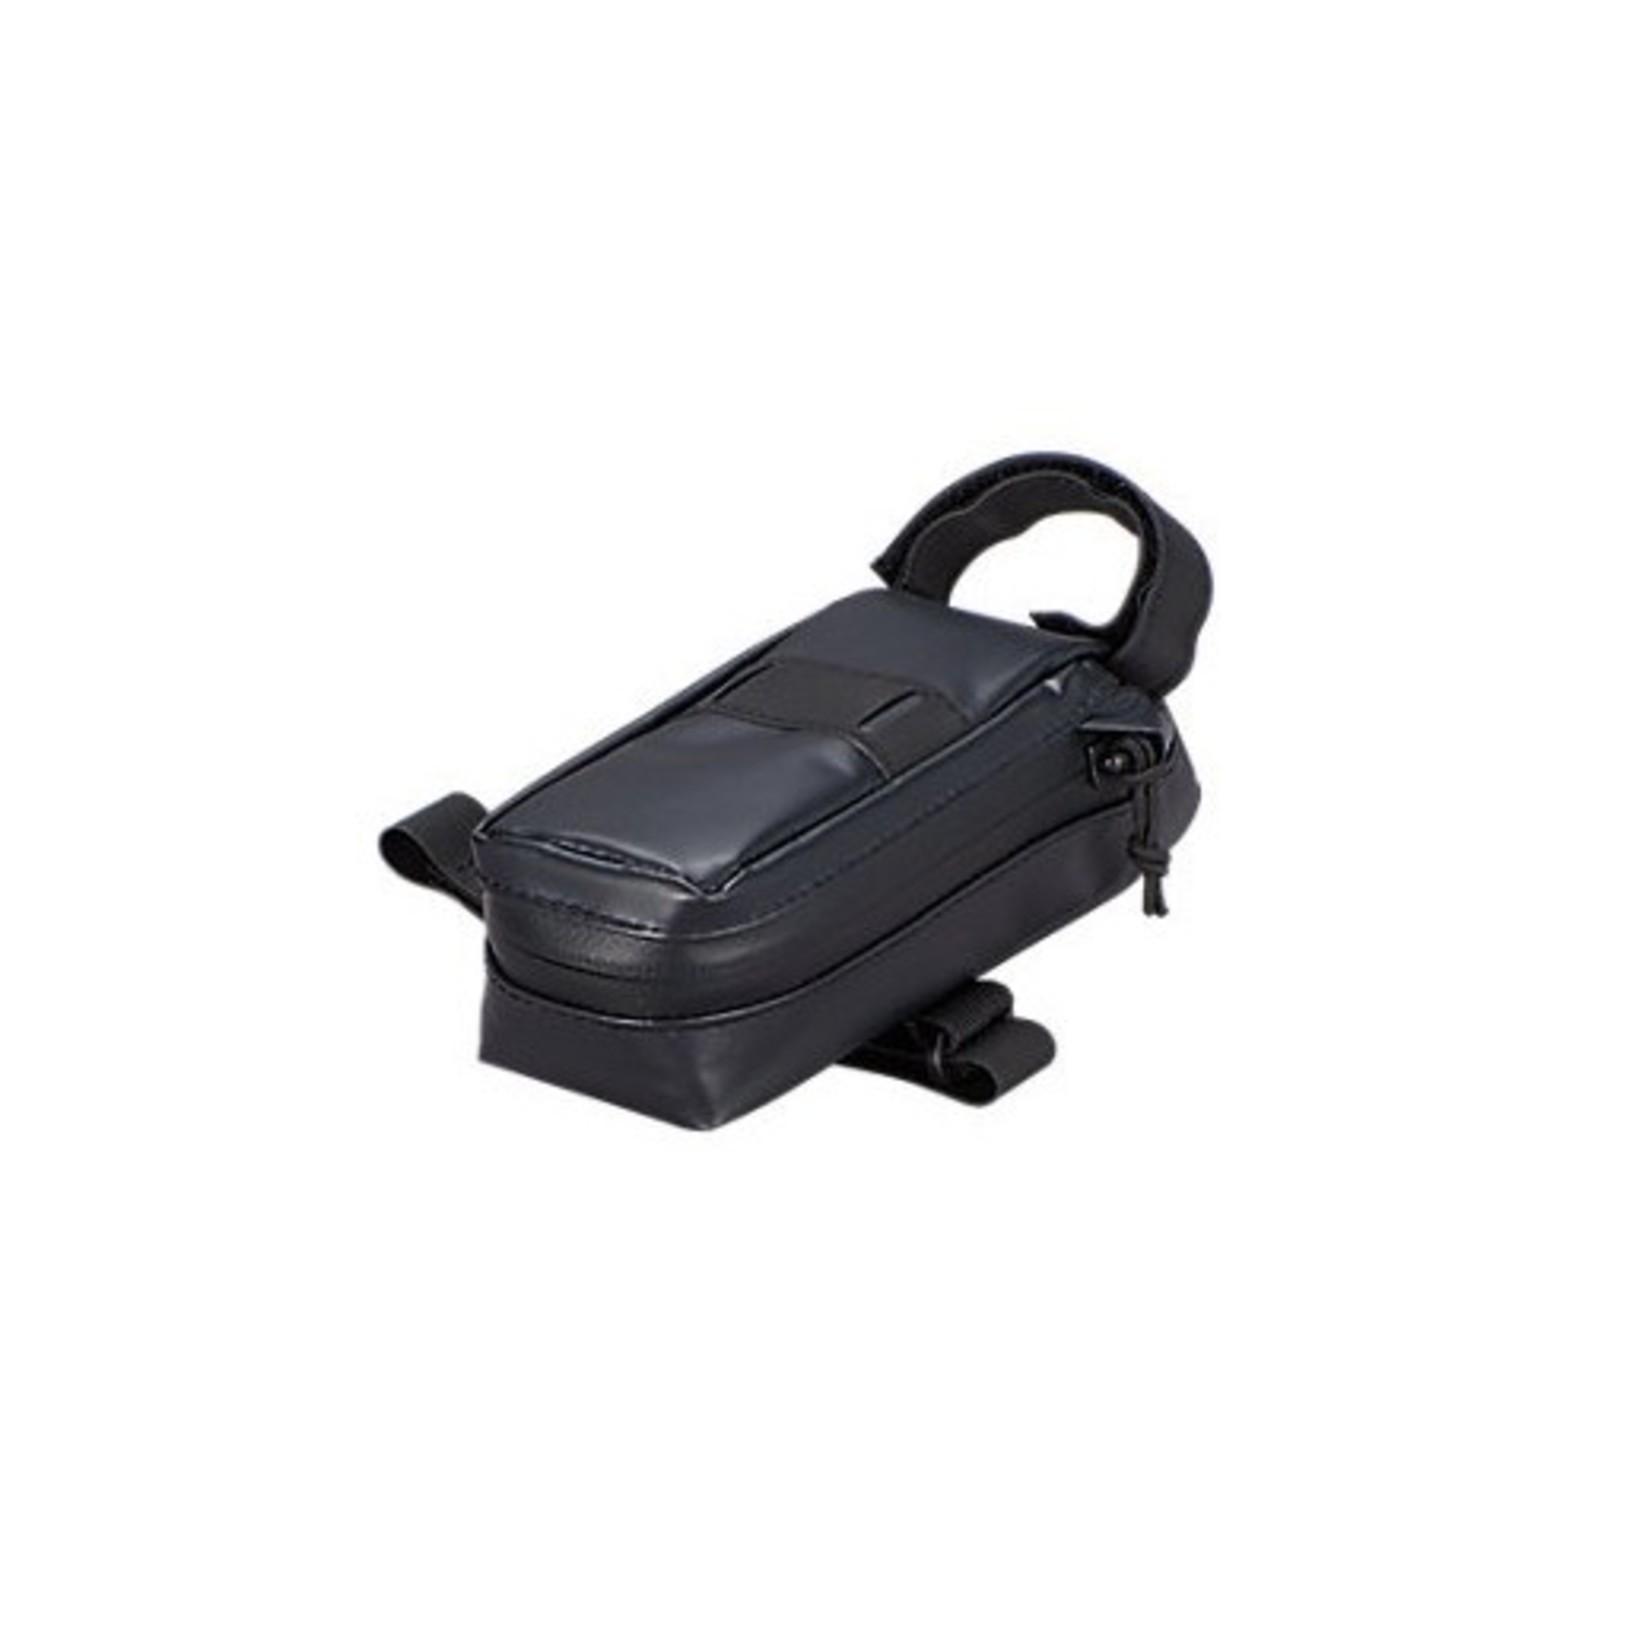 Specialized Specialized Wedgie Seat Bag, Black